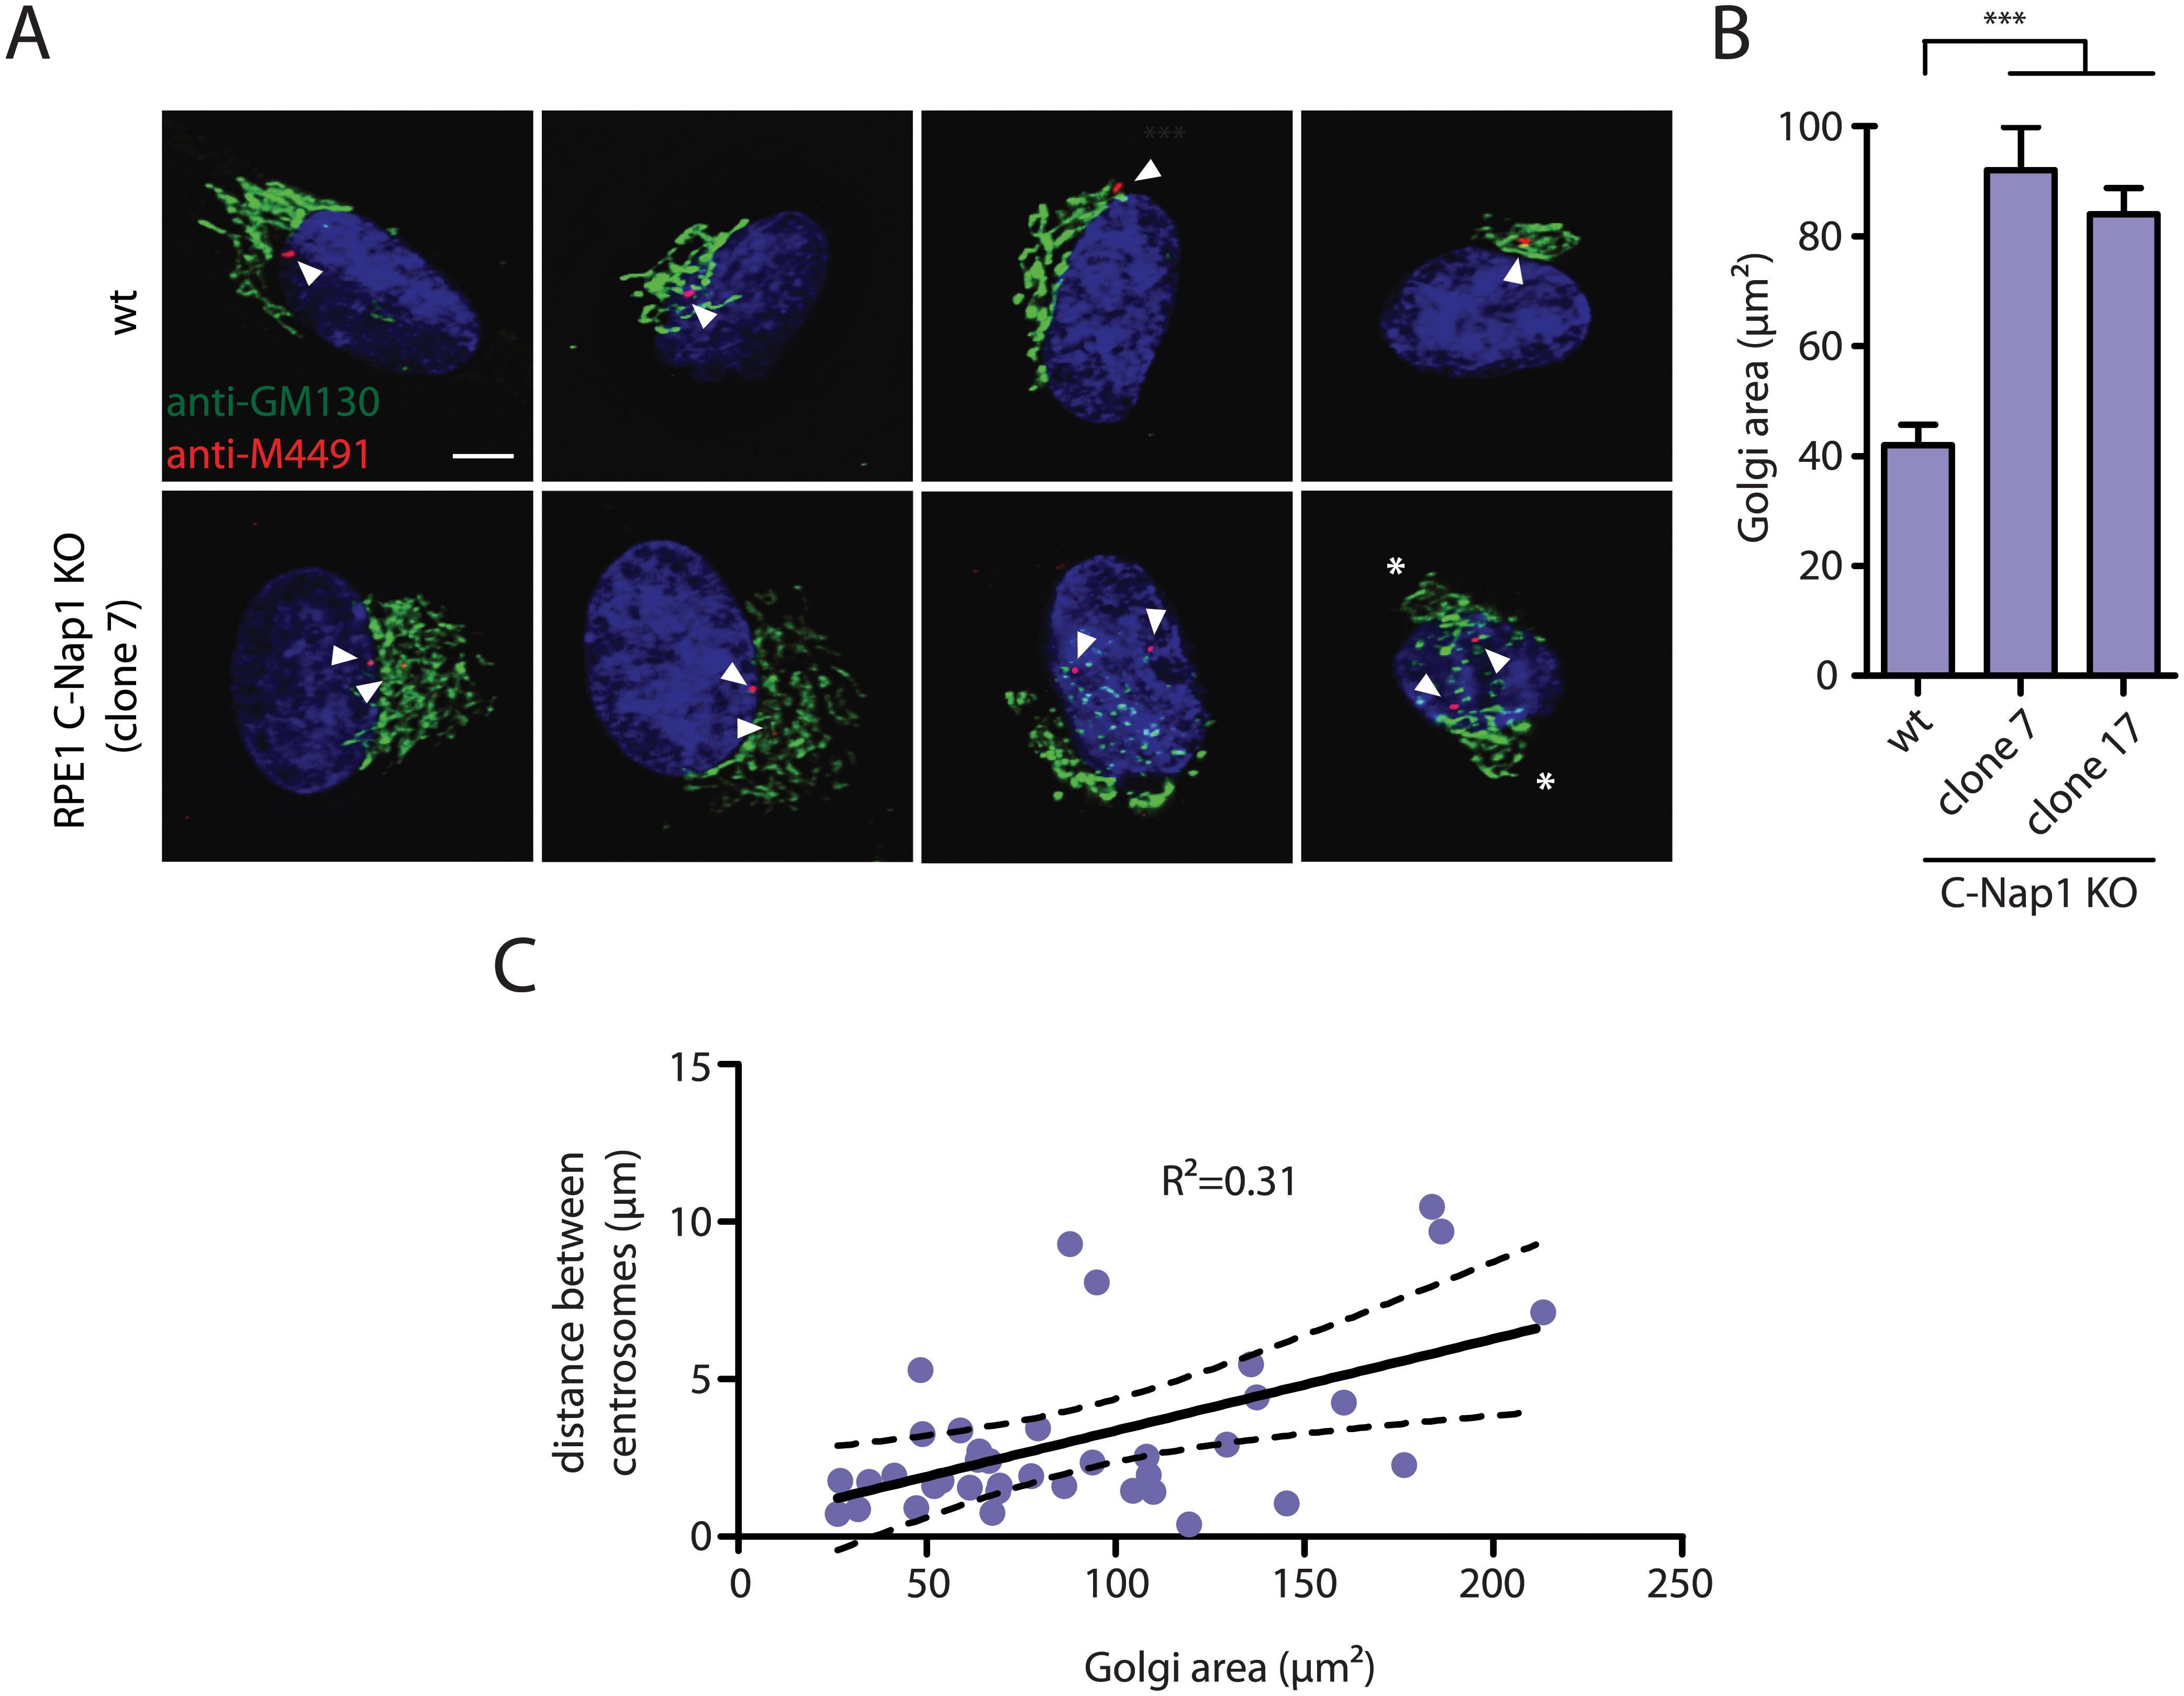 RPE1 C-Nap1 KO cells have Golgi organization defects.